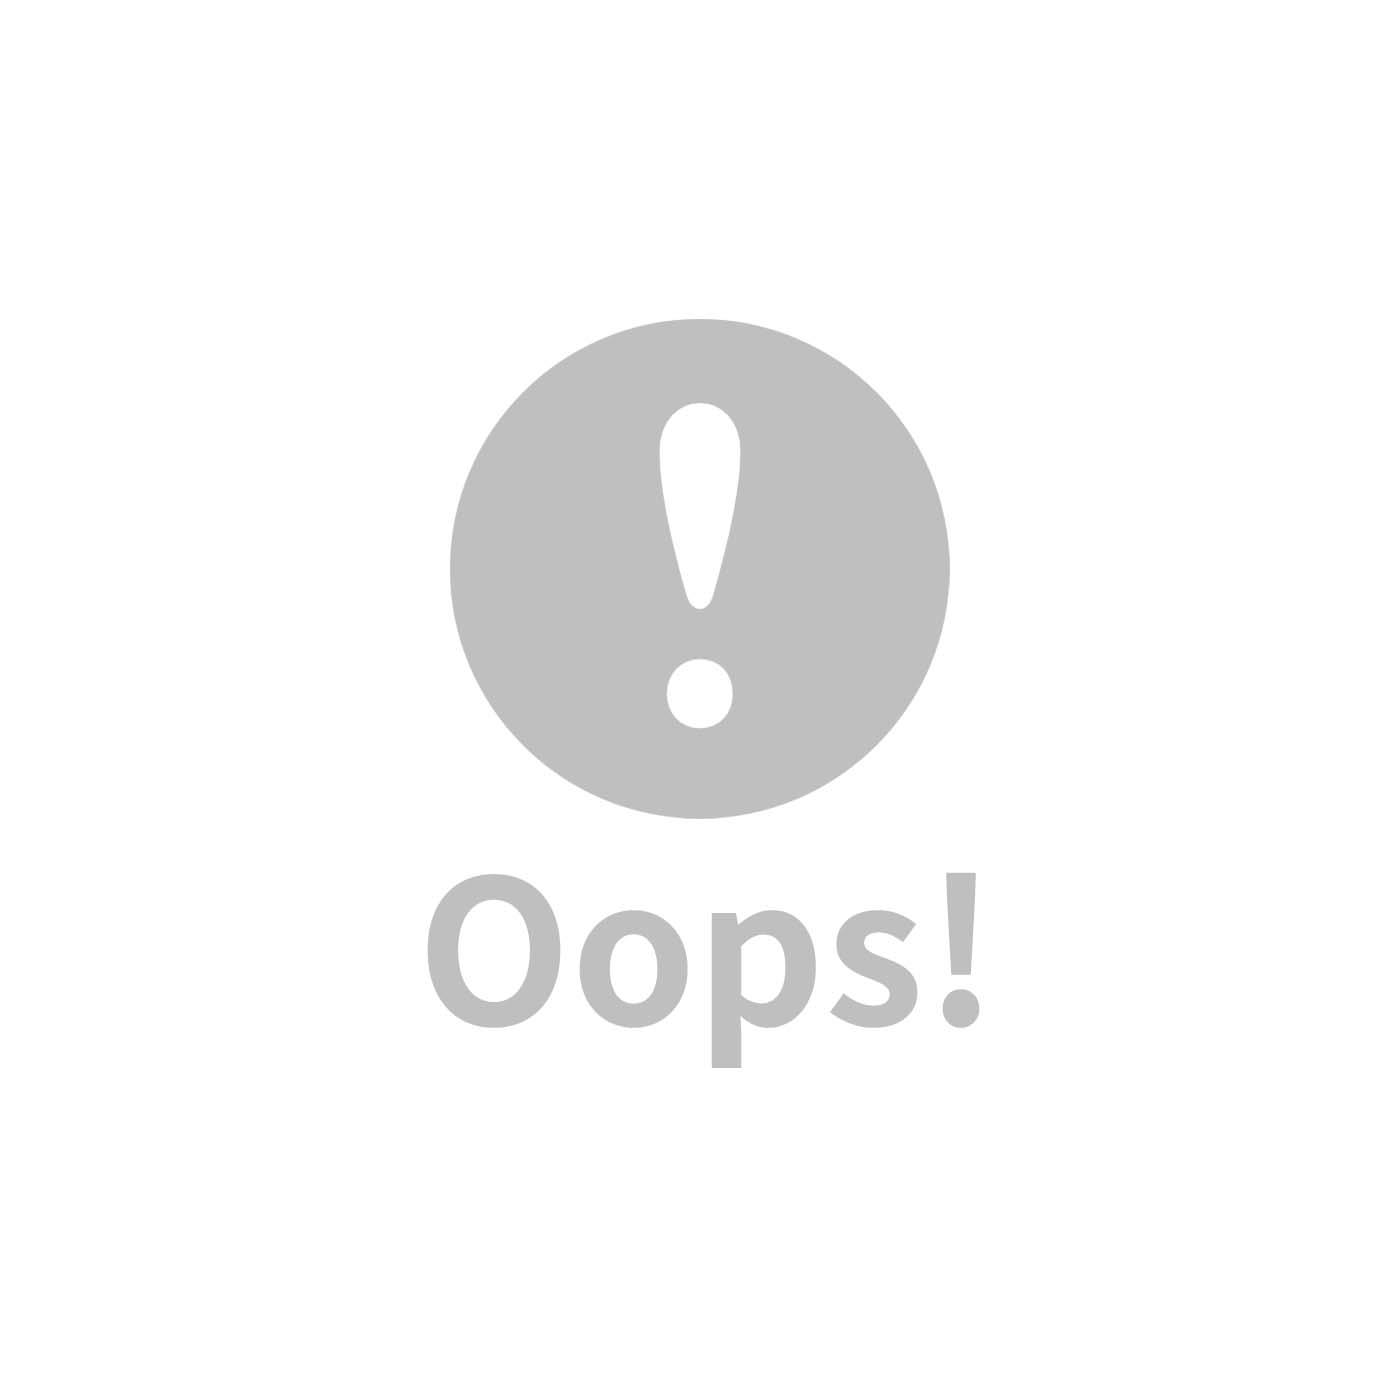 global affairs 童話手工編織安撫搖鈴_動物派對(小獅王)